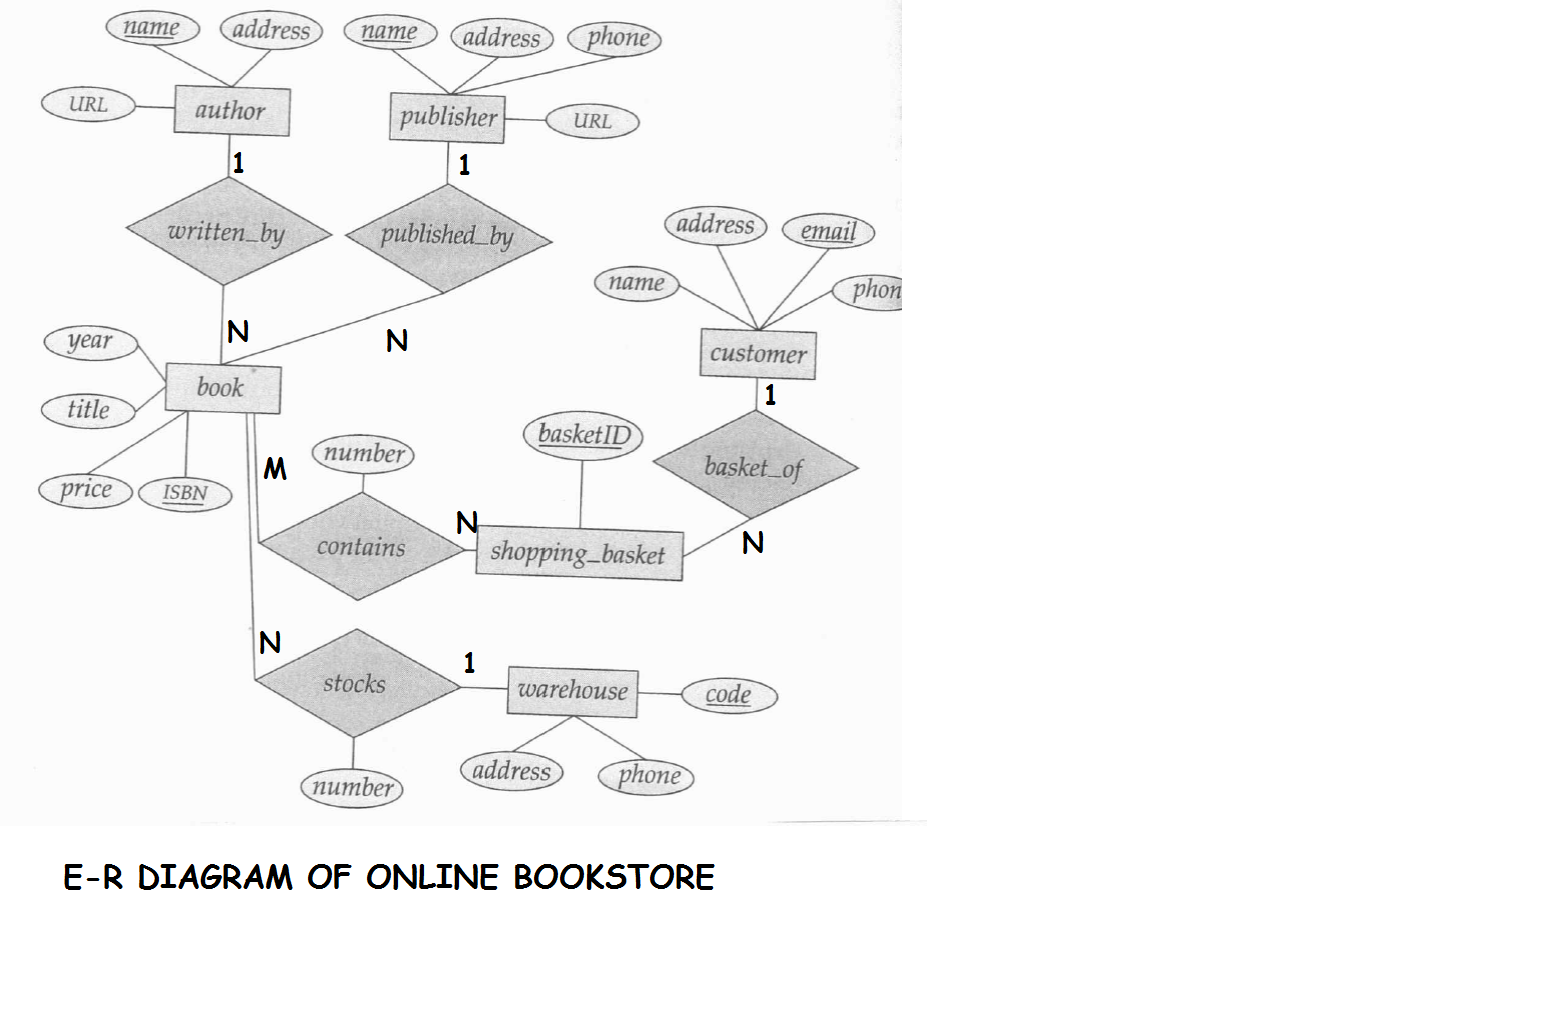 Diagram] Er Diagram Of Online Bookstore Management Full